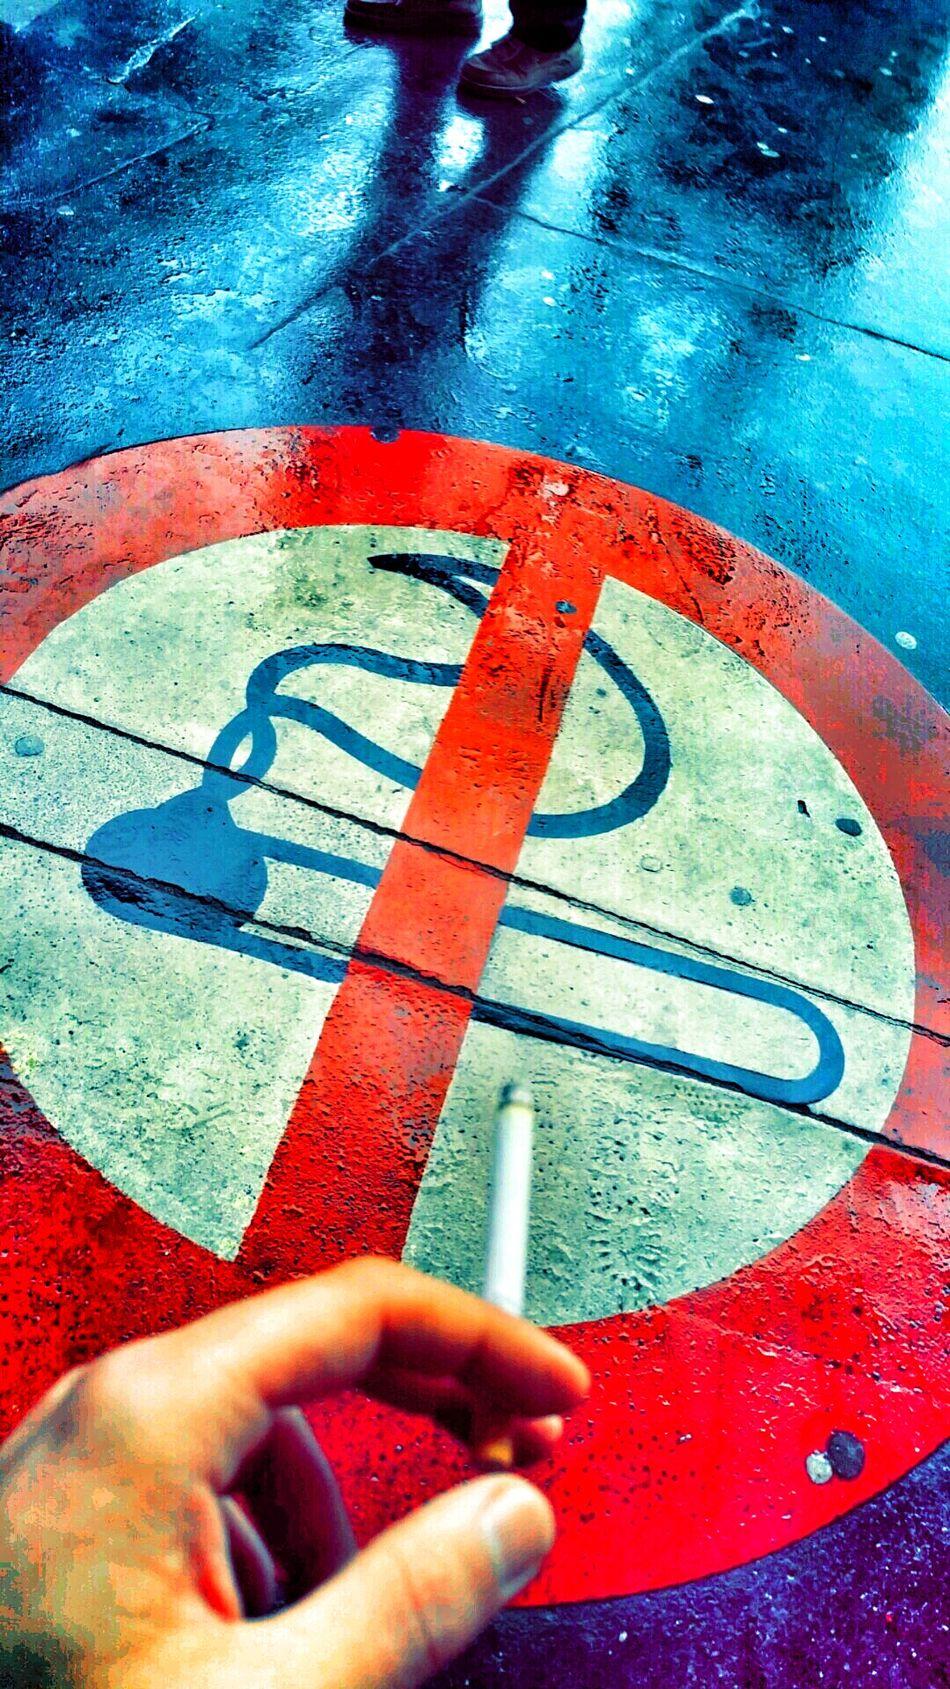 Smoking No Smoking No Smoking In Public No Smoking Sign First Eyeem Photo Cigarette  Interdit De Fumer Paris, France  Saint Lazare Snap Snapchat Snapseed Hdr_Collection